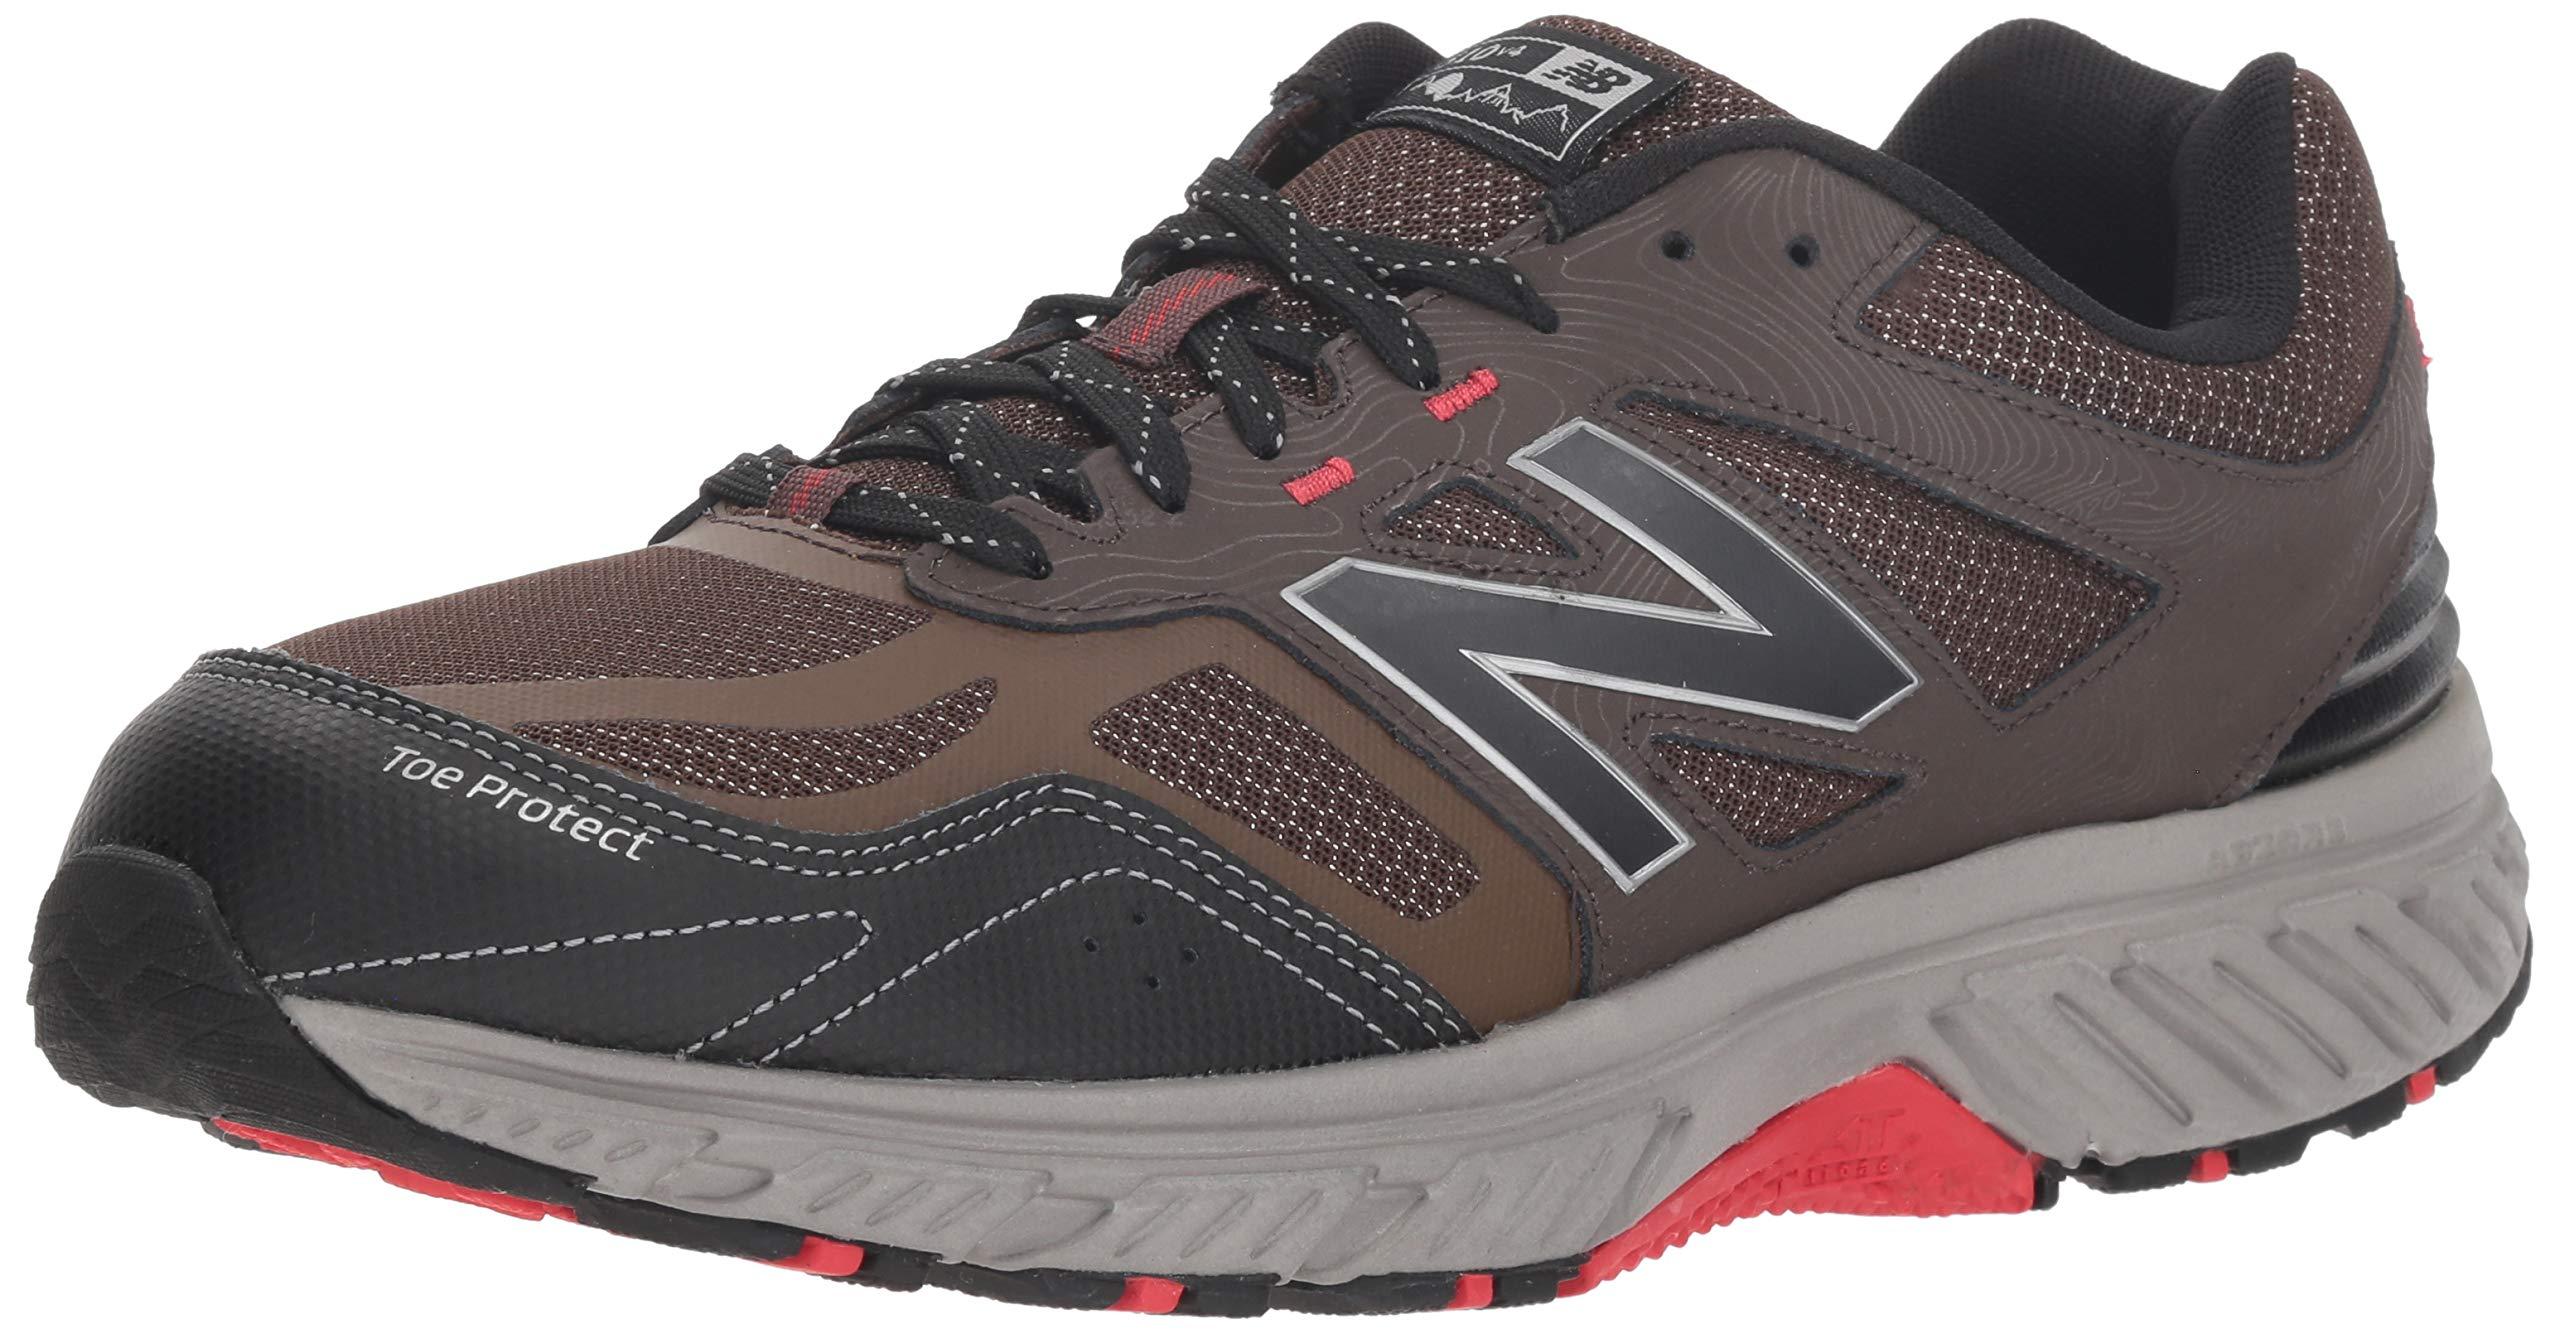 New Balance Men's 510v4 Cushioning Trail Running Shoe, Chocolate/Black/Team red, 8.5 XW US